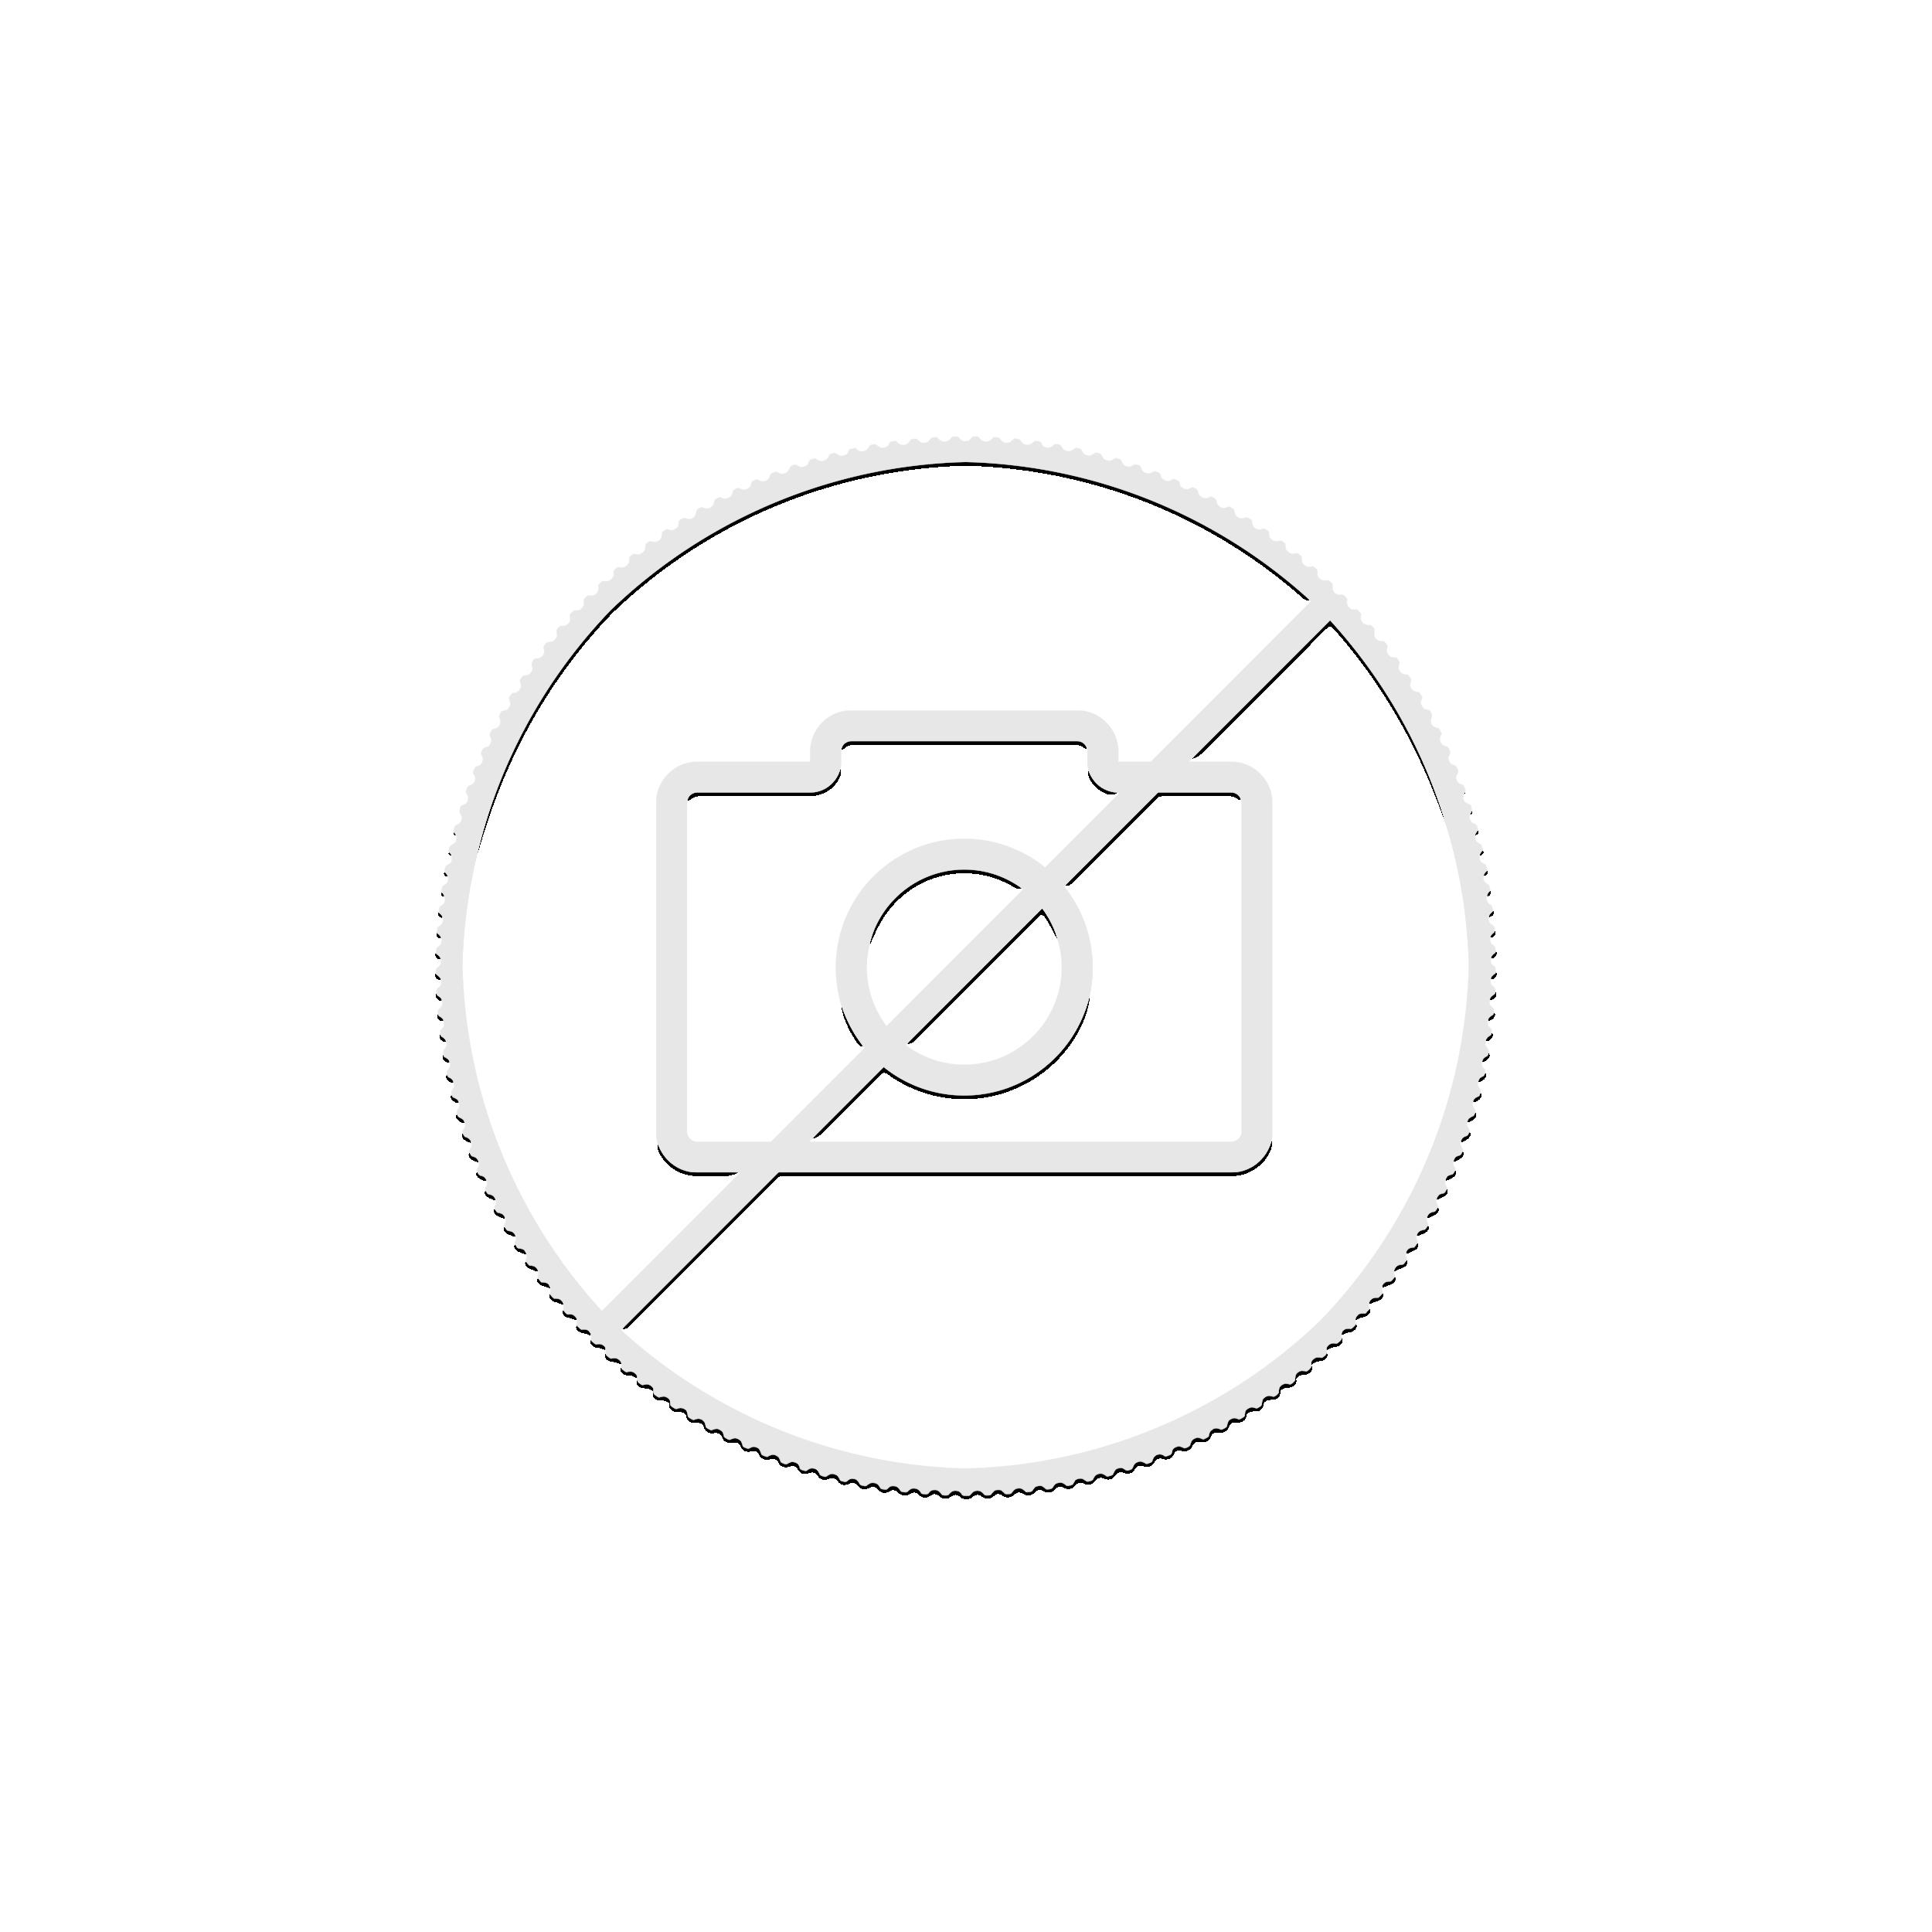 2016 1 kilogram silver Kookaburra coin